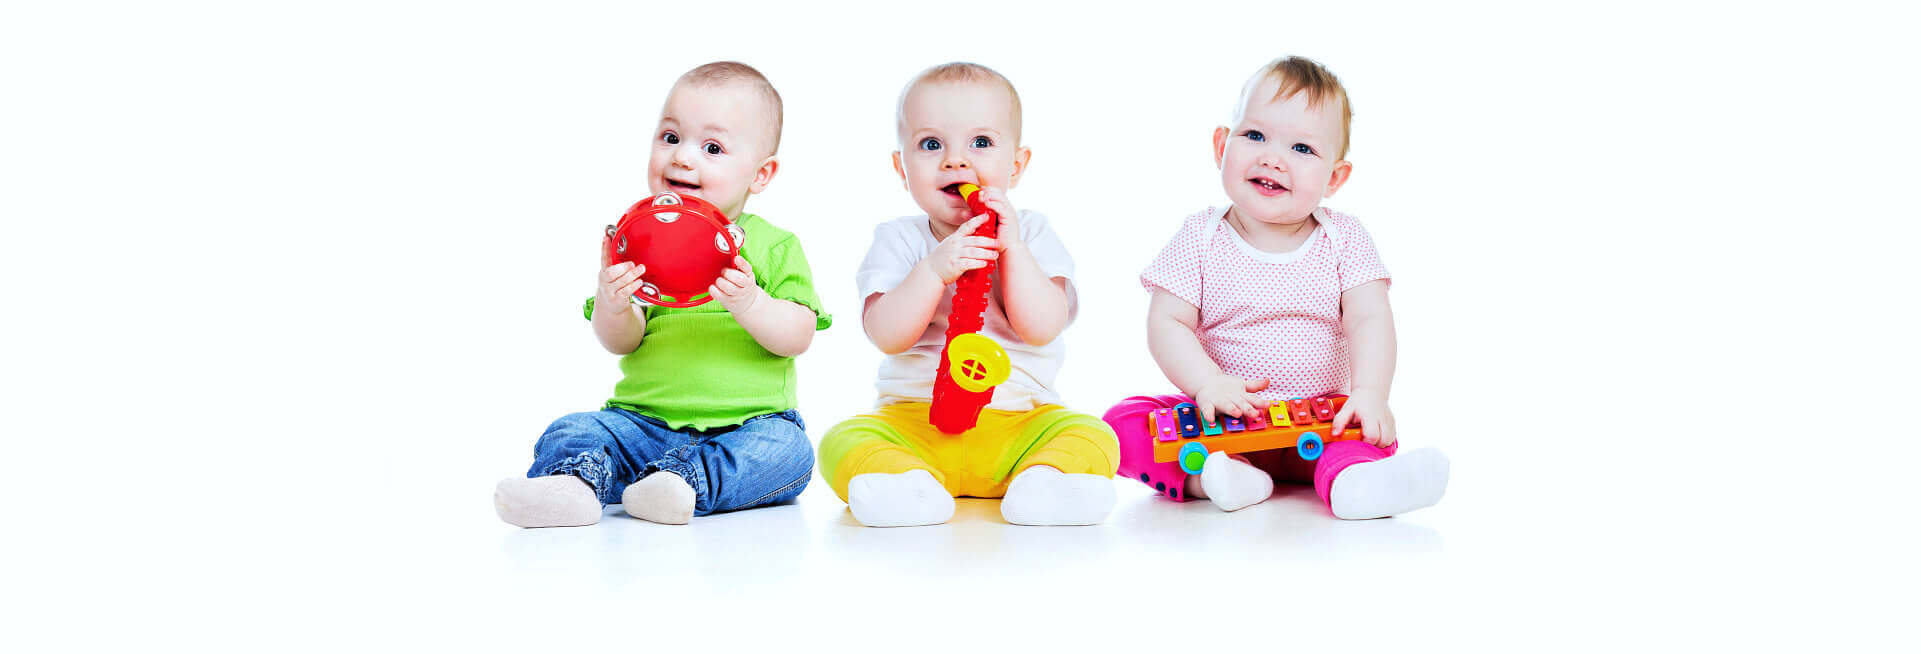 three babies smiling